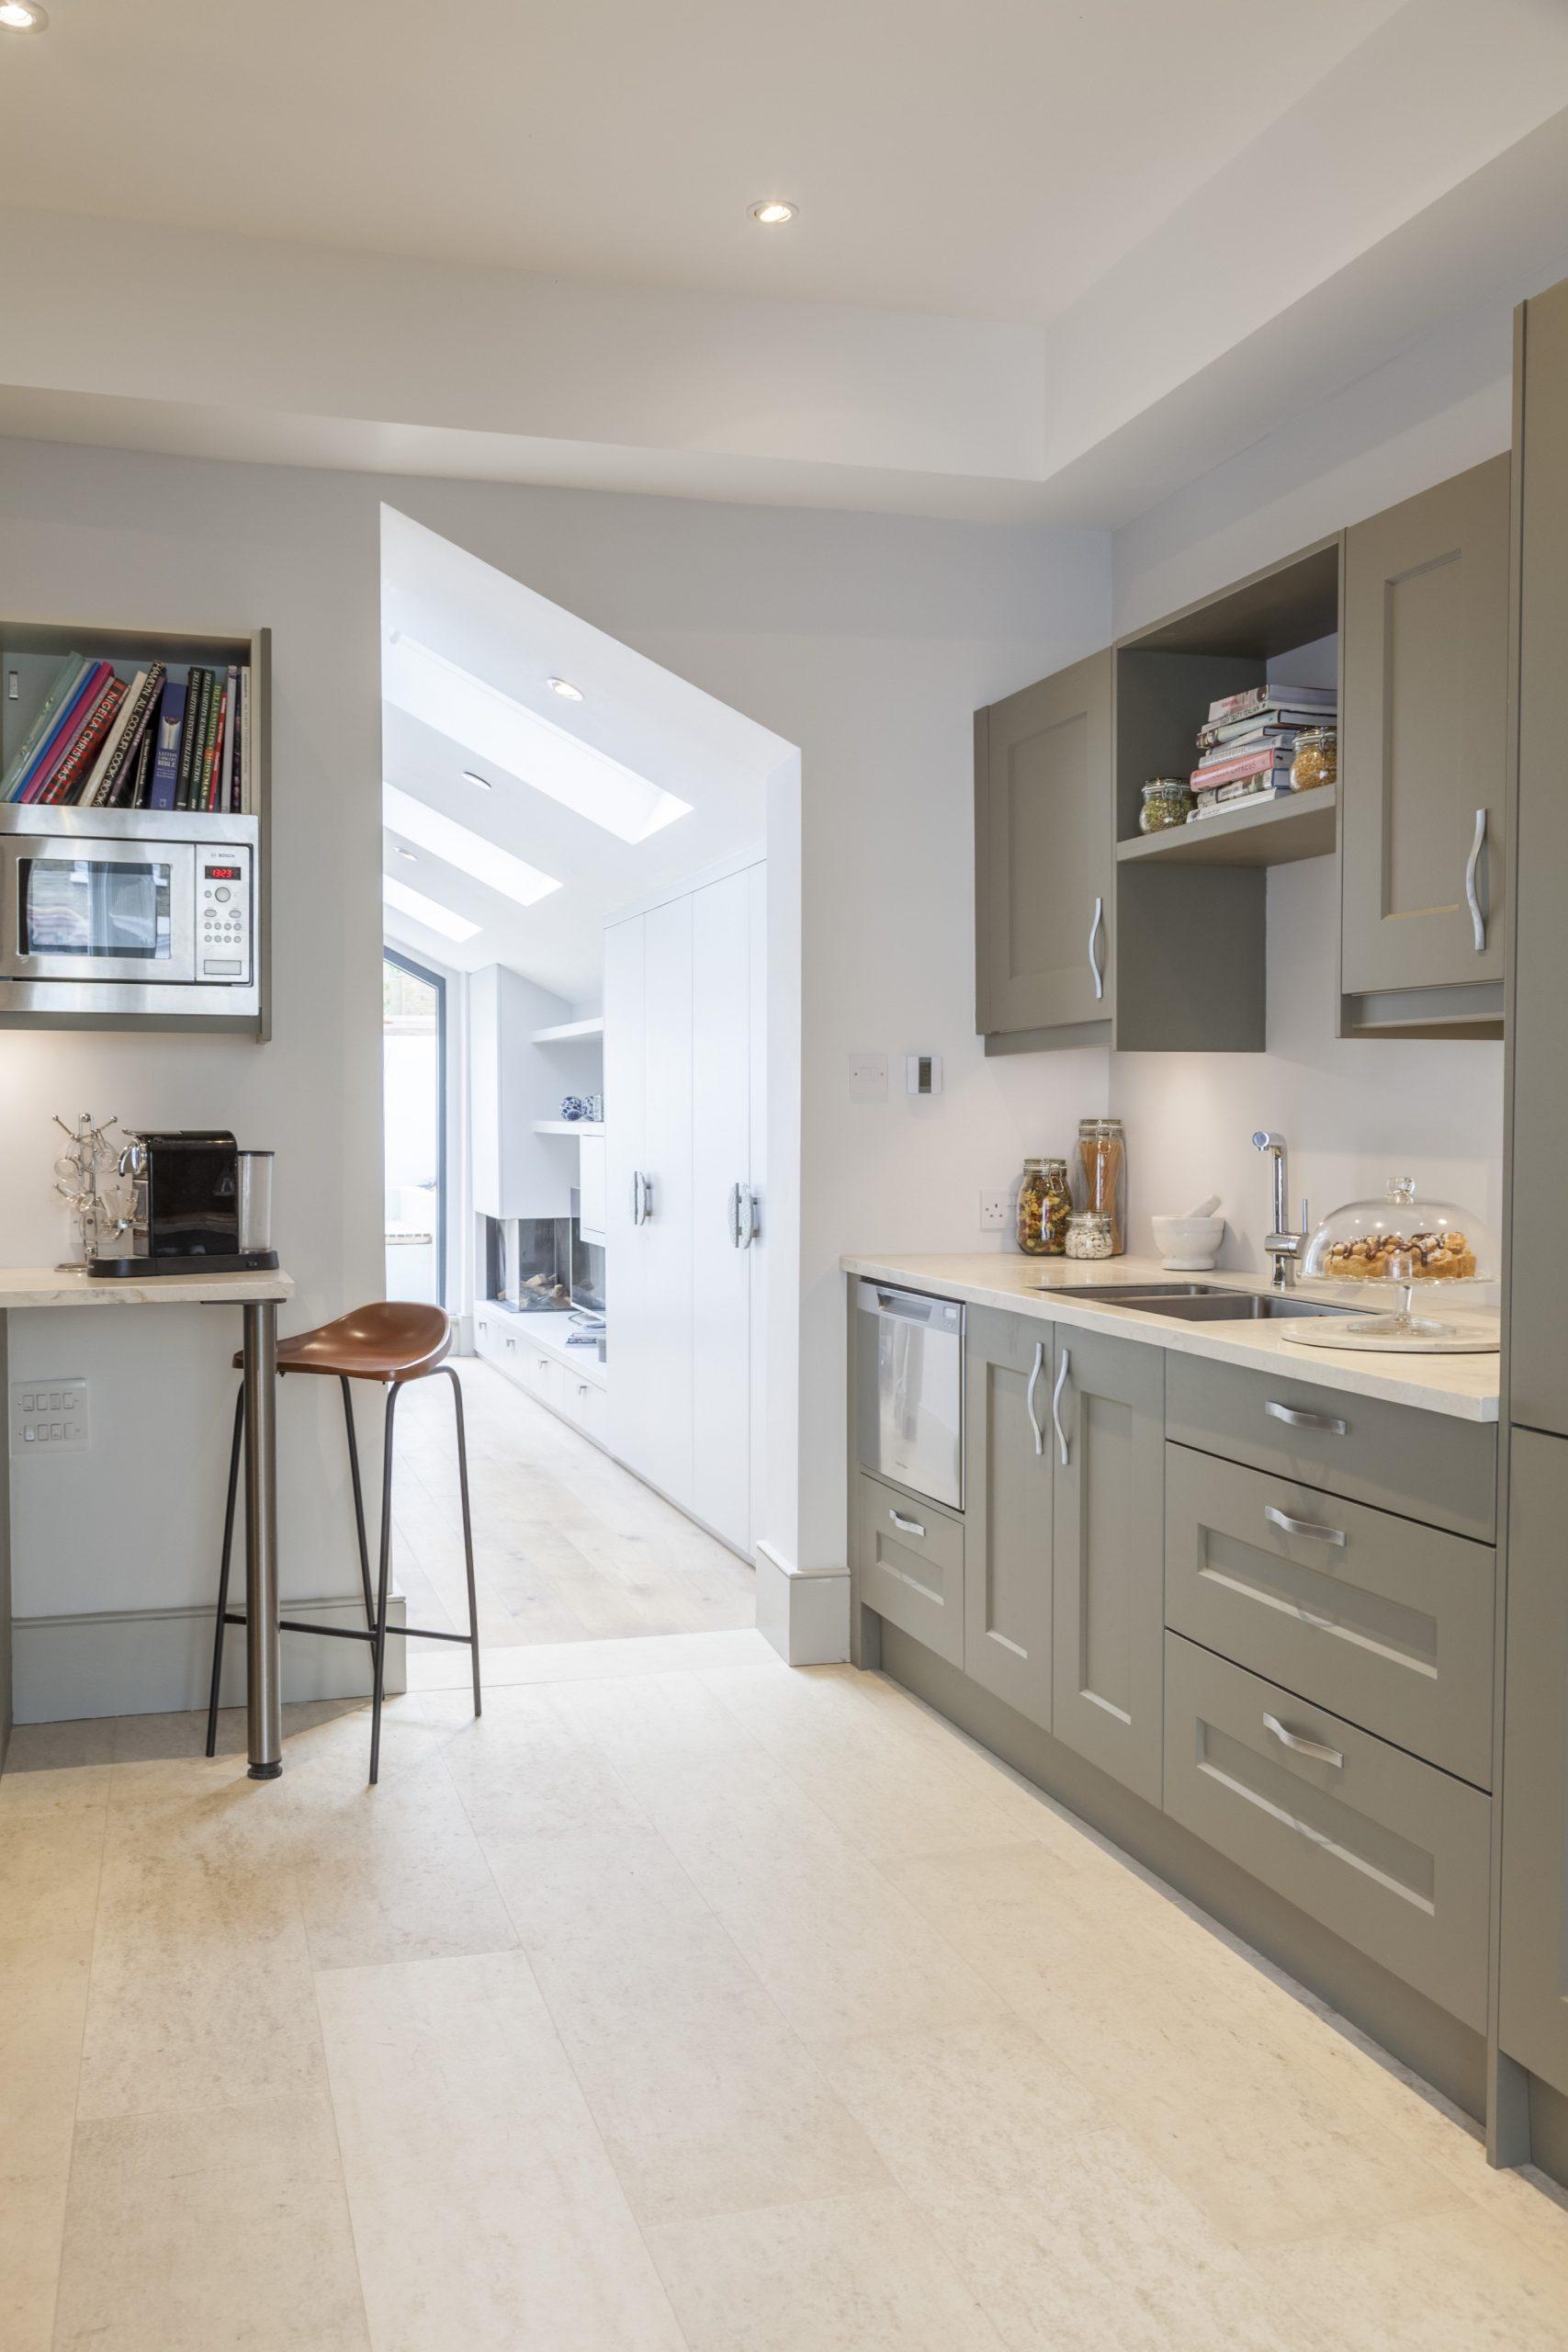 rjv-home-design-refurbishment-london-5f2136a5b6d68